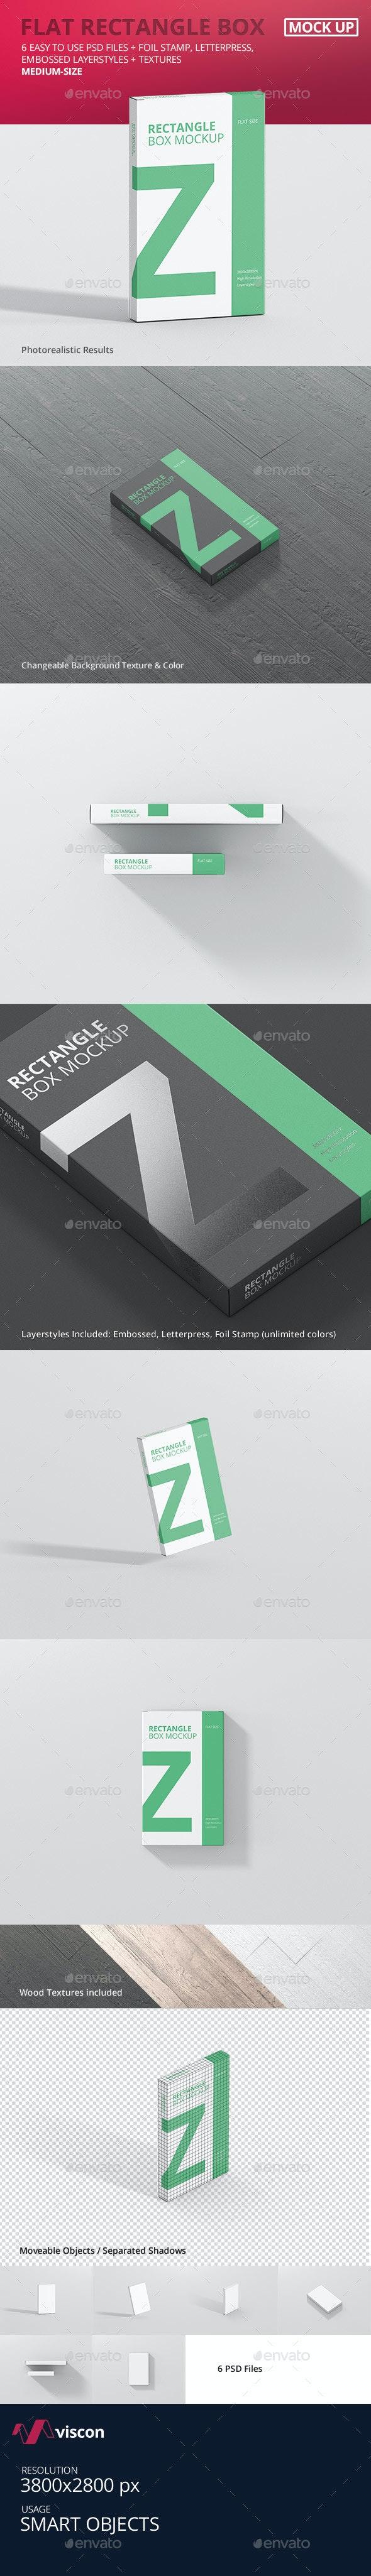 Box Mockup - Medium Size Flat Rectangle - Miscellaneous Packaging